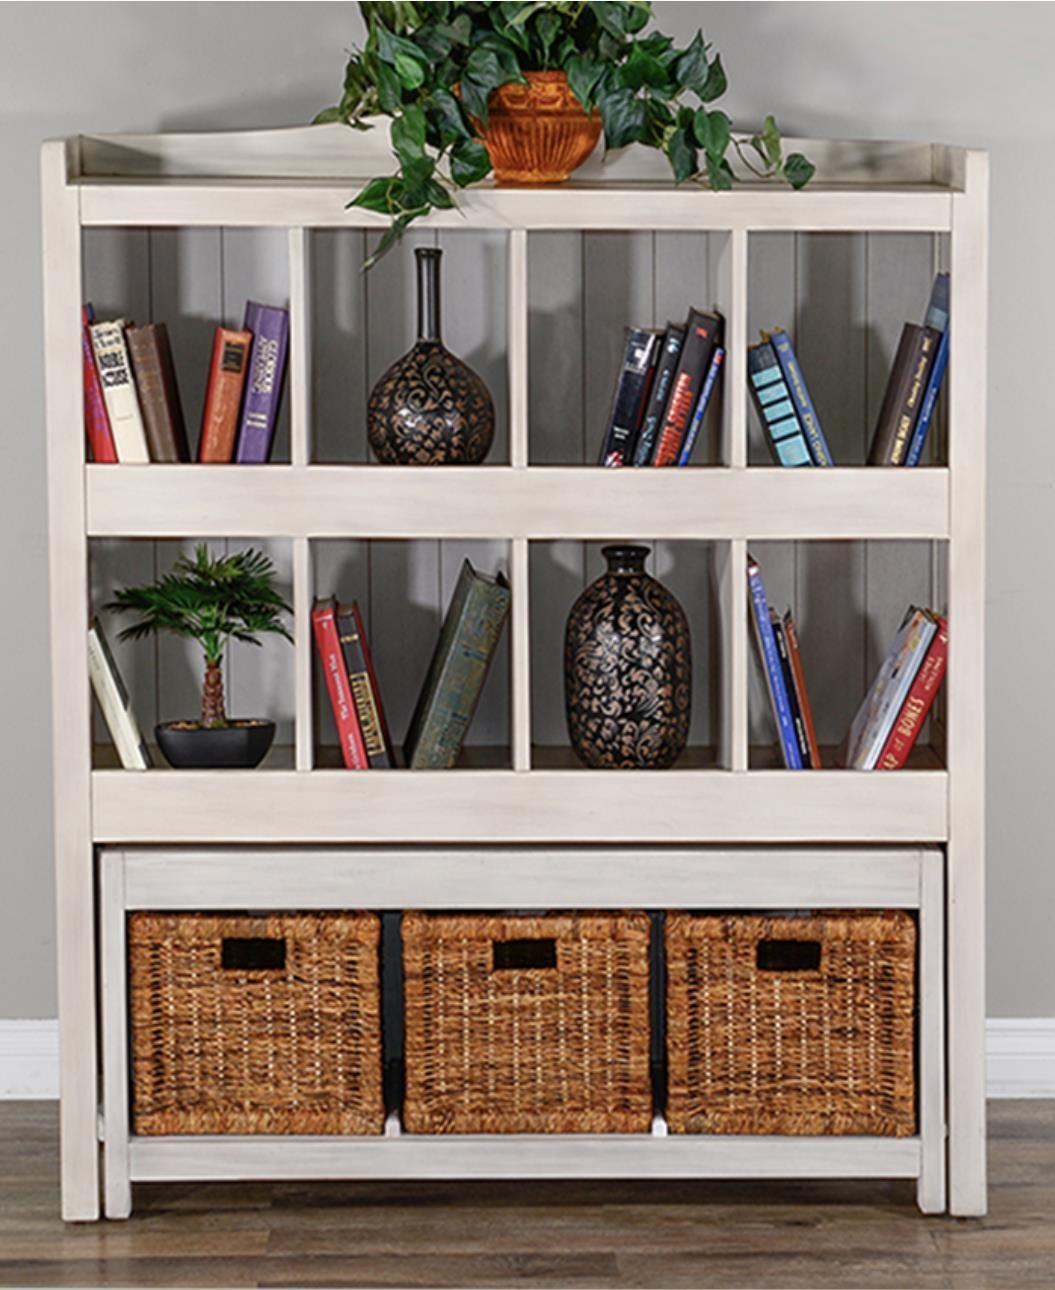 2993 Storage Bookcase at Bennett's Furniture and Mattresses